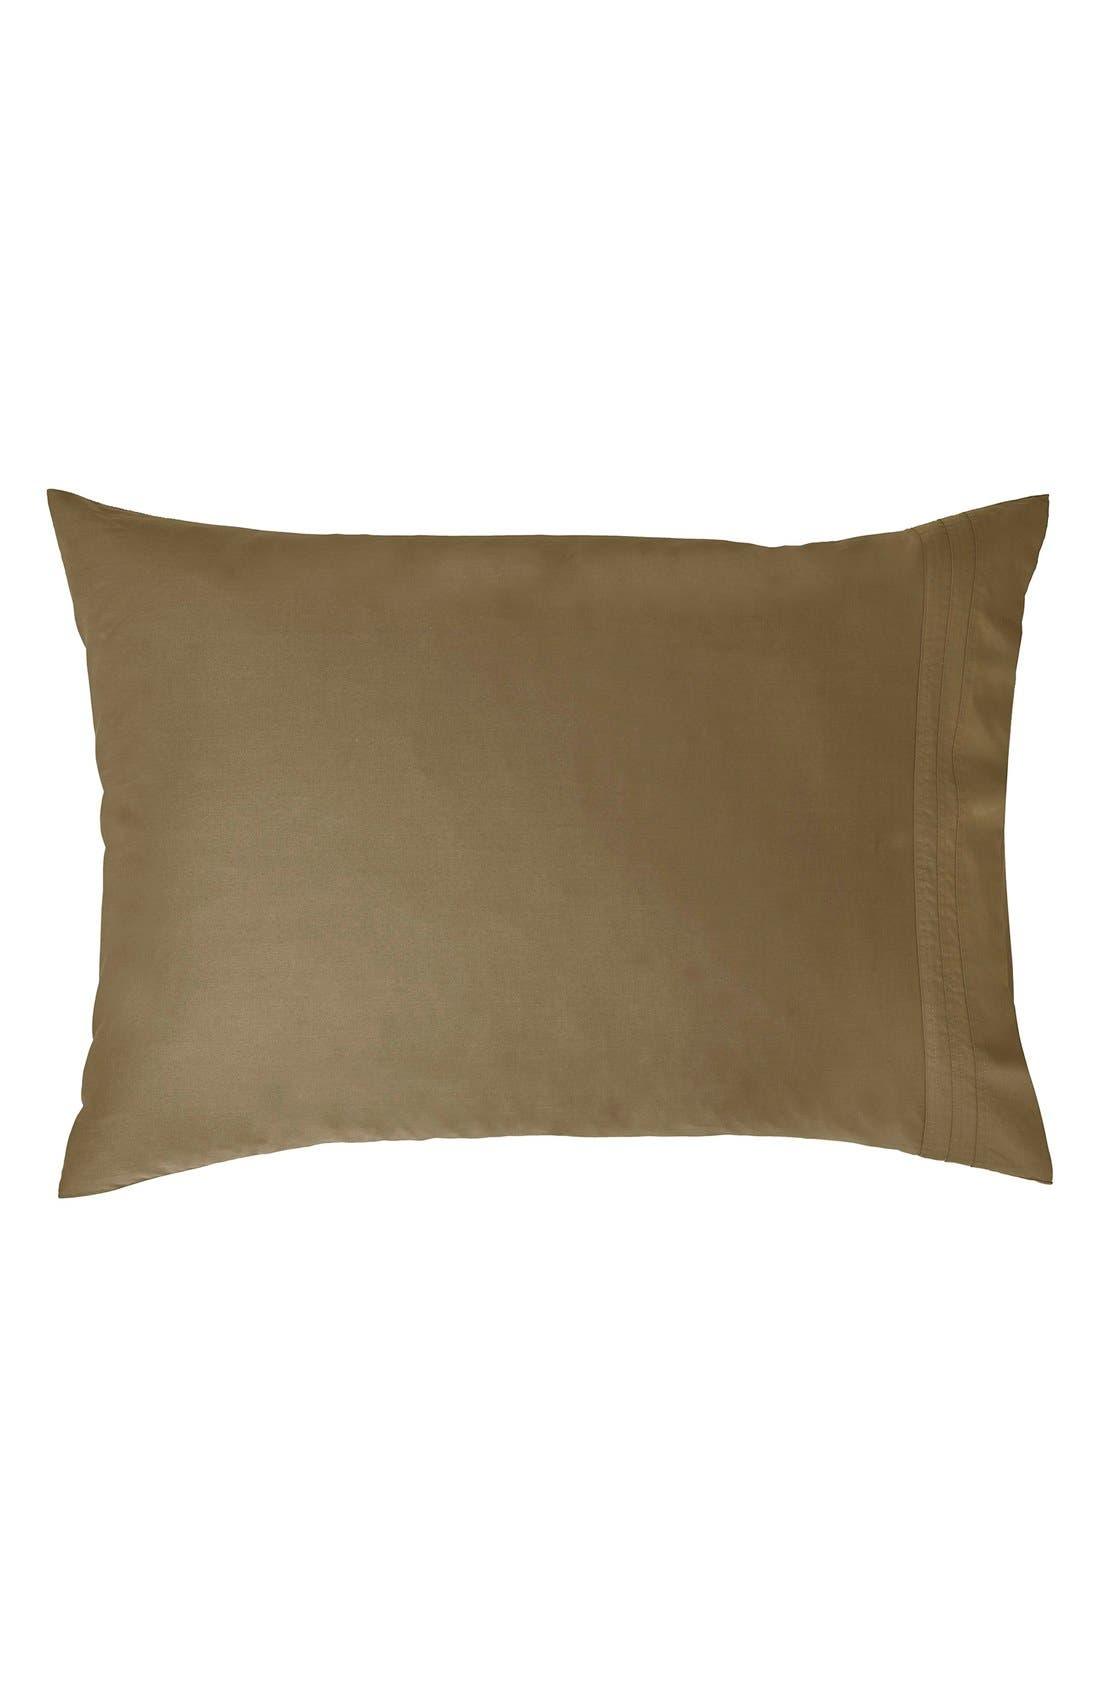 Donna Karan Collection 510 Thread Count Pillowcases,                             Main thumbnail 1, color,                             Shiitake